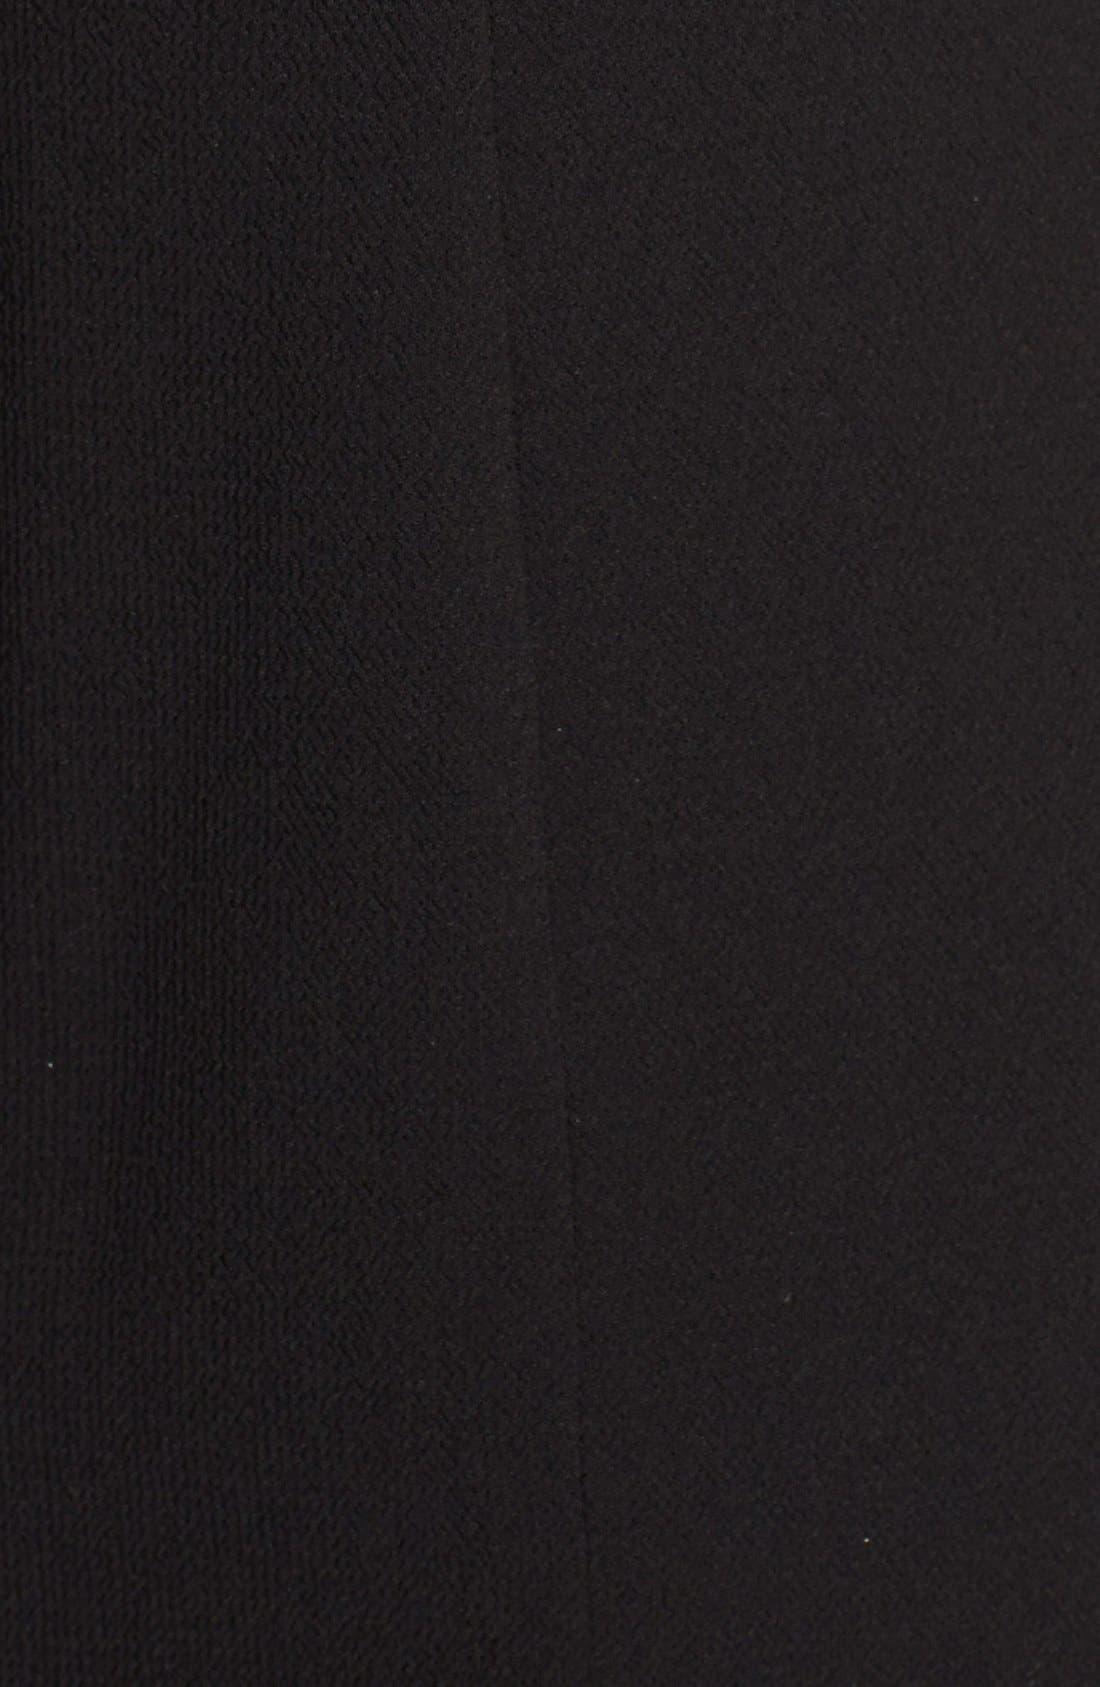 Alternate Image 3  - Adrianna Papell Faux Leather Trim Cutout Sheath Dress